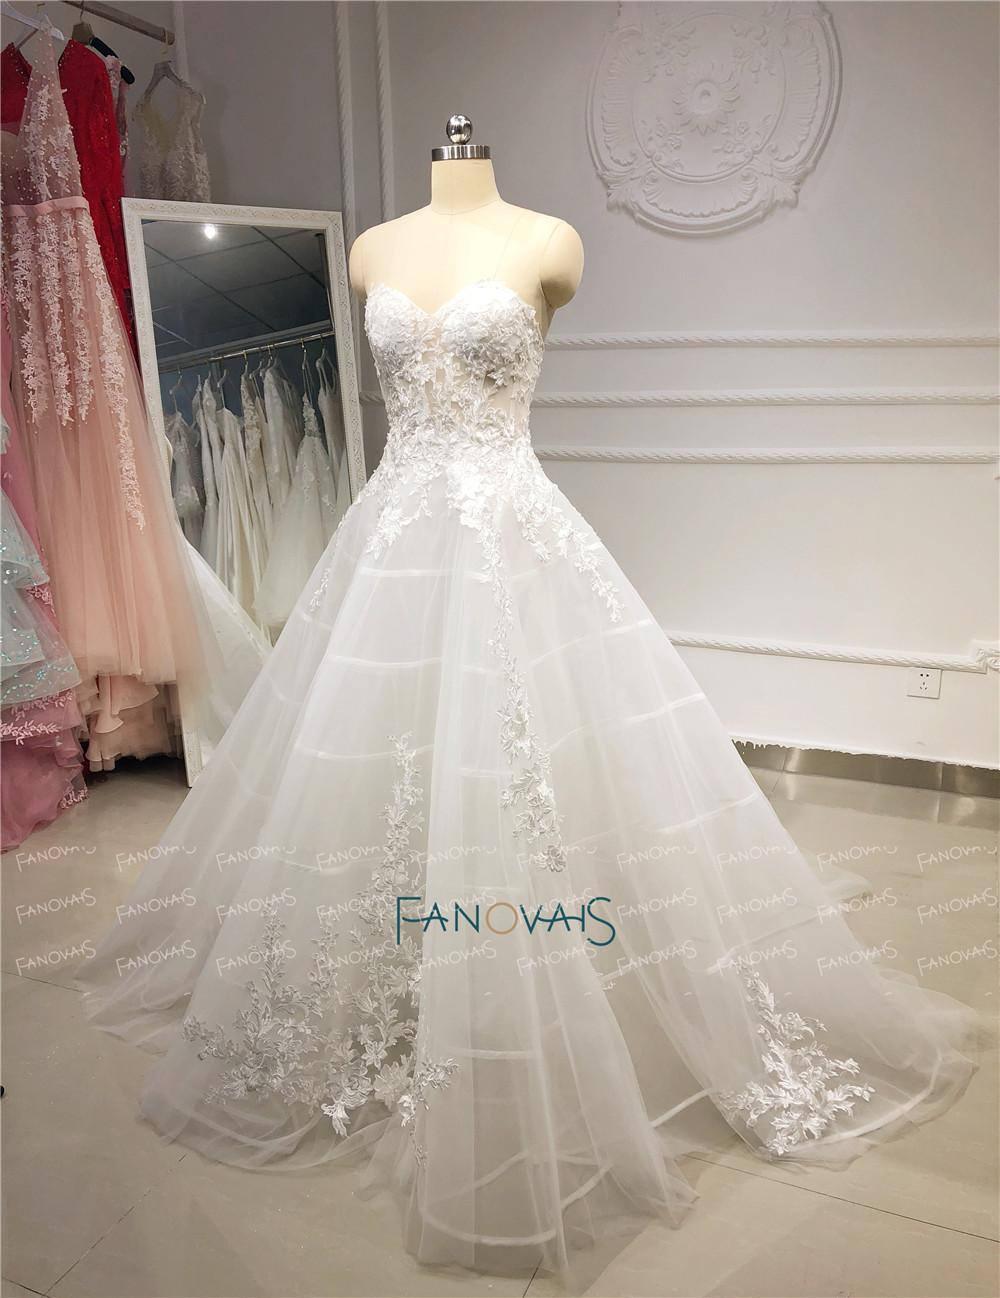 Image 3 - Unique Wedding Dresses 2019 Sweetehart A Line Lace Wedding Gown Boho Sheer Bridal Dress Wedding Vestido de Novia 2019 NW43Wedding Dresses   -